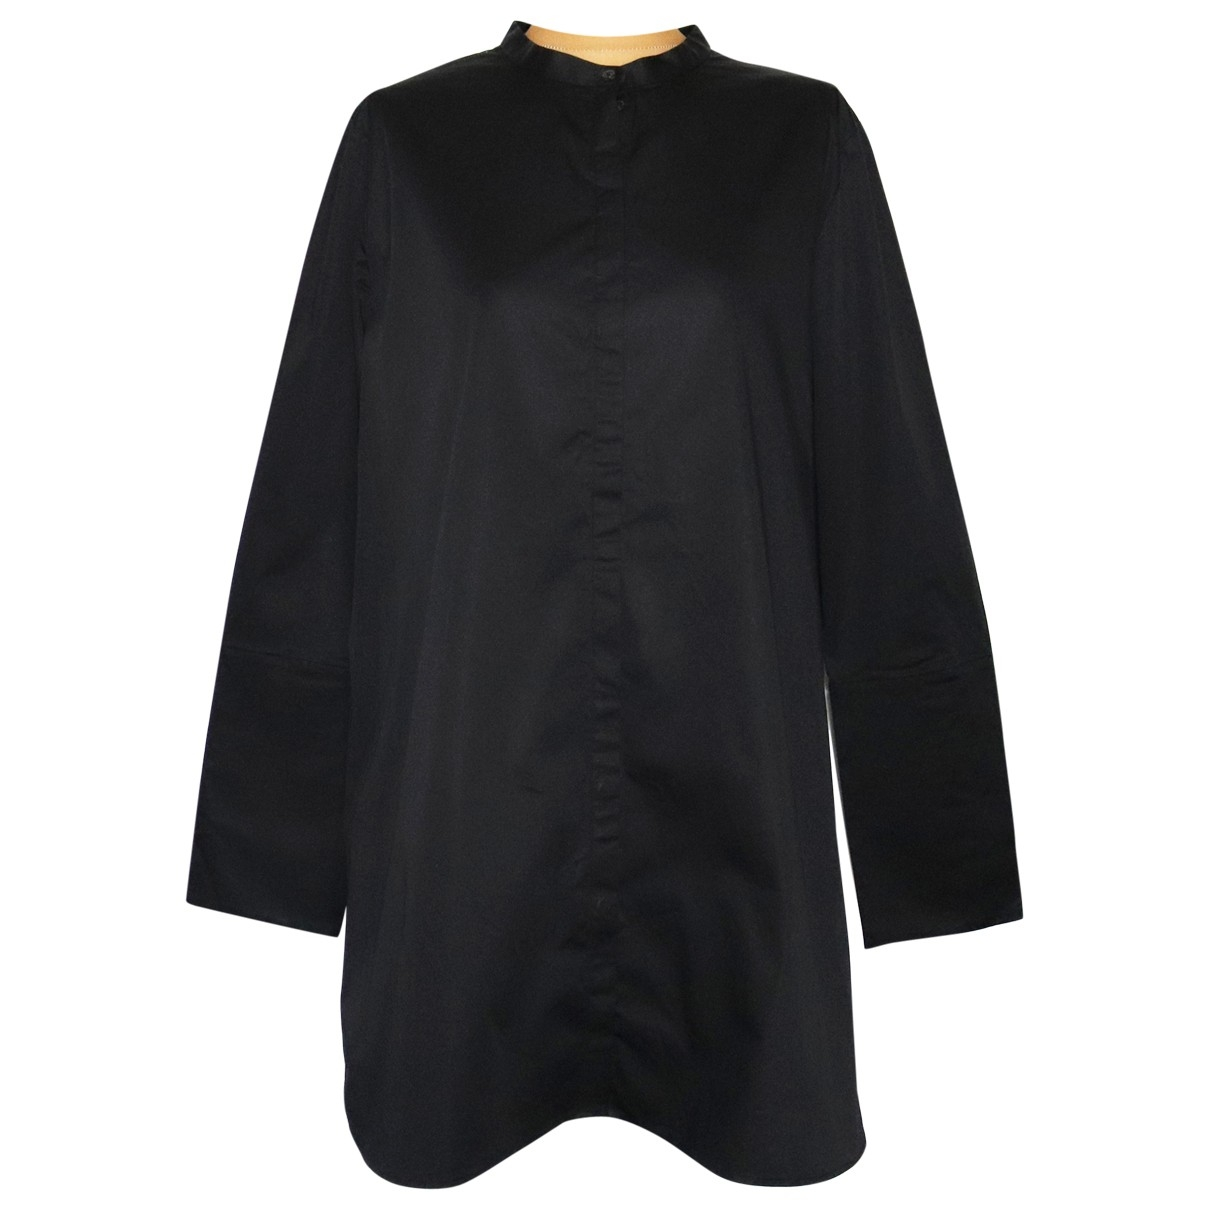 Cos \N Black Cotton - elasthane dress for Women 44 FR